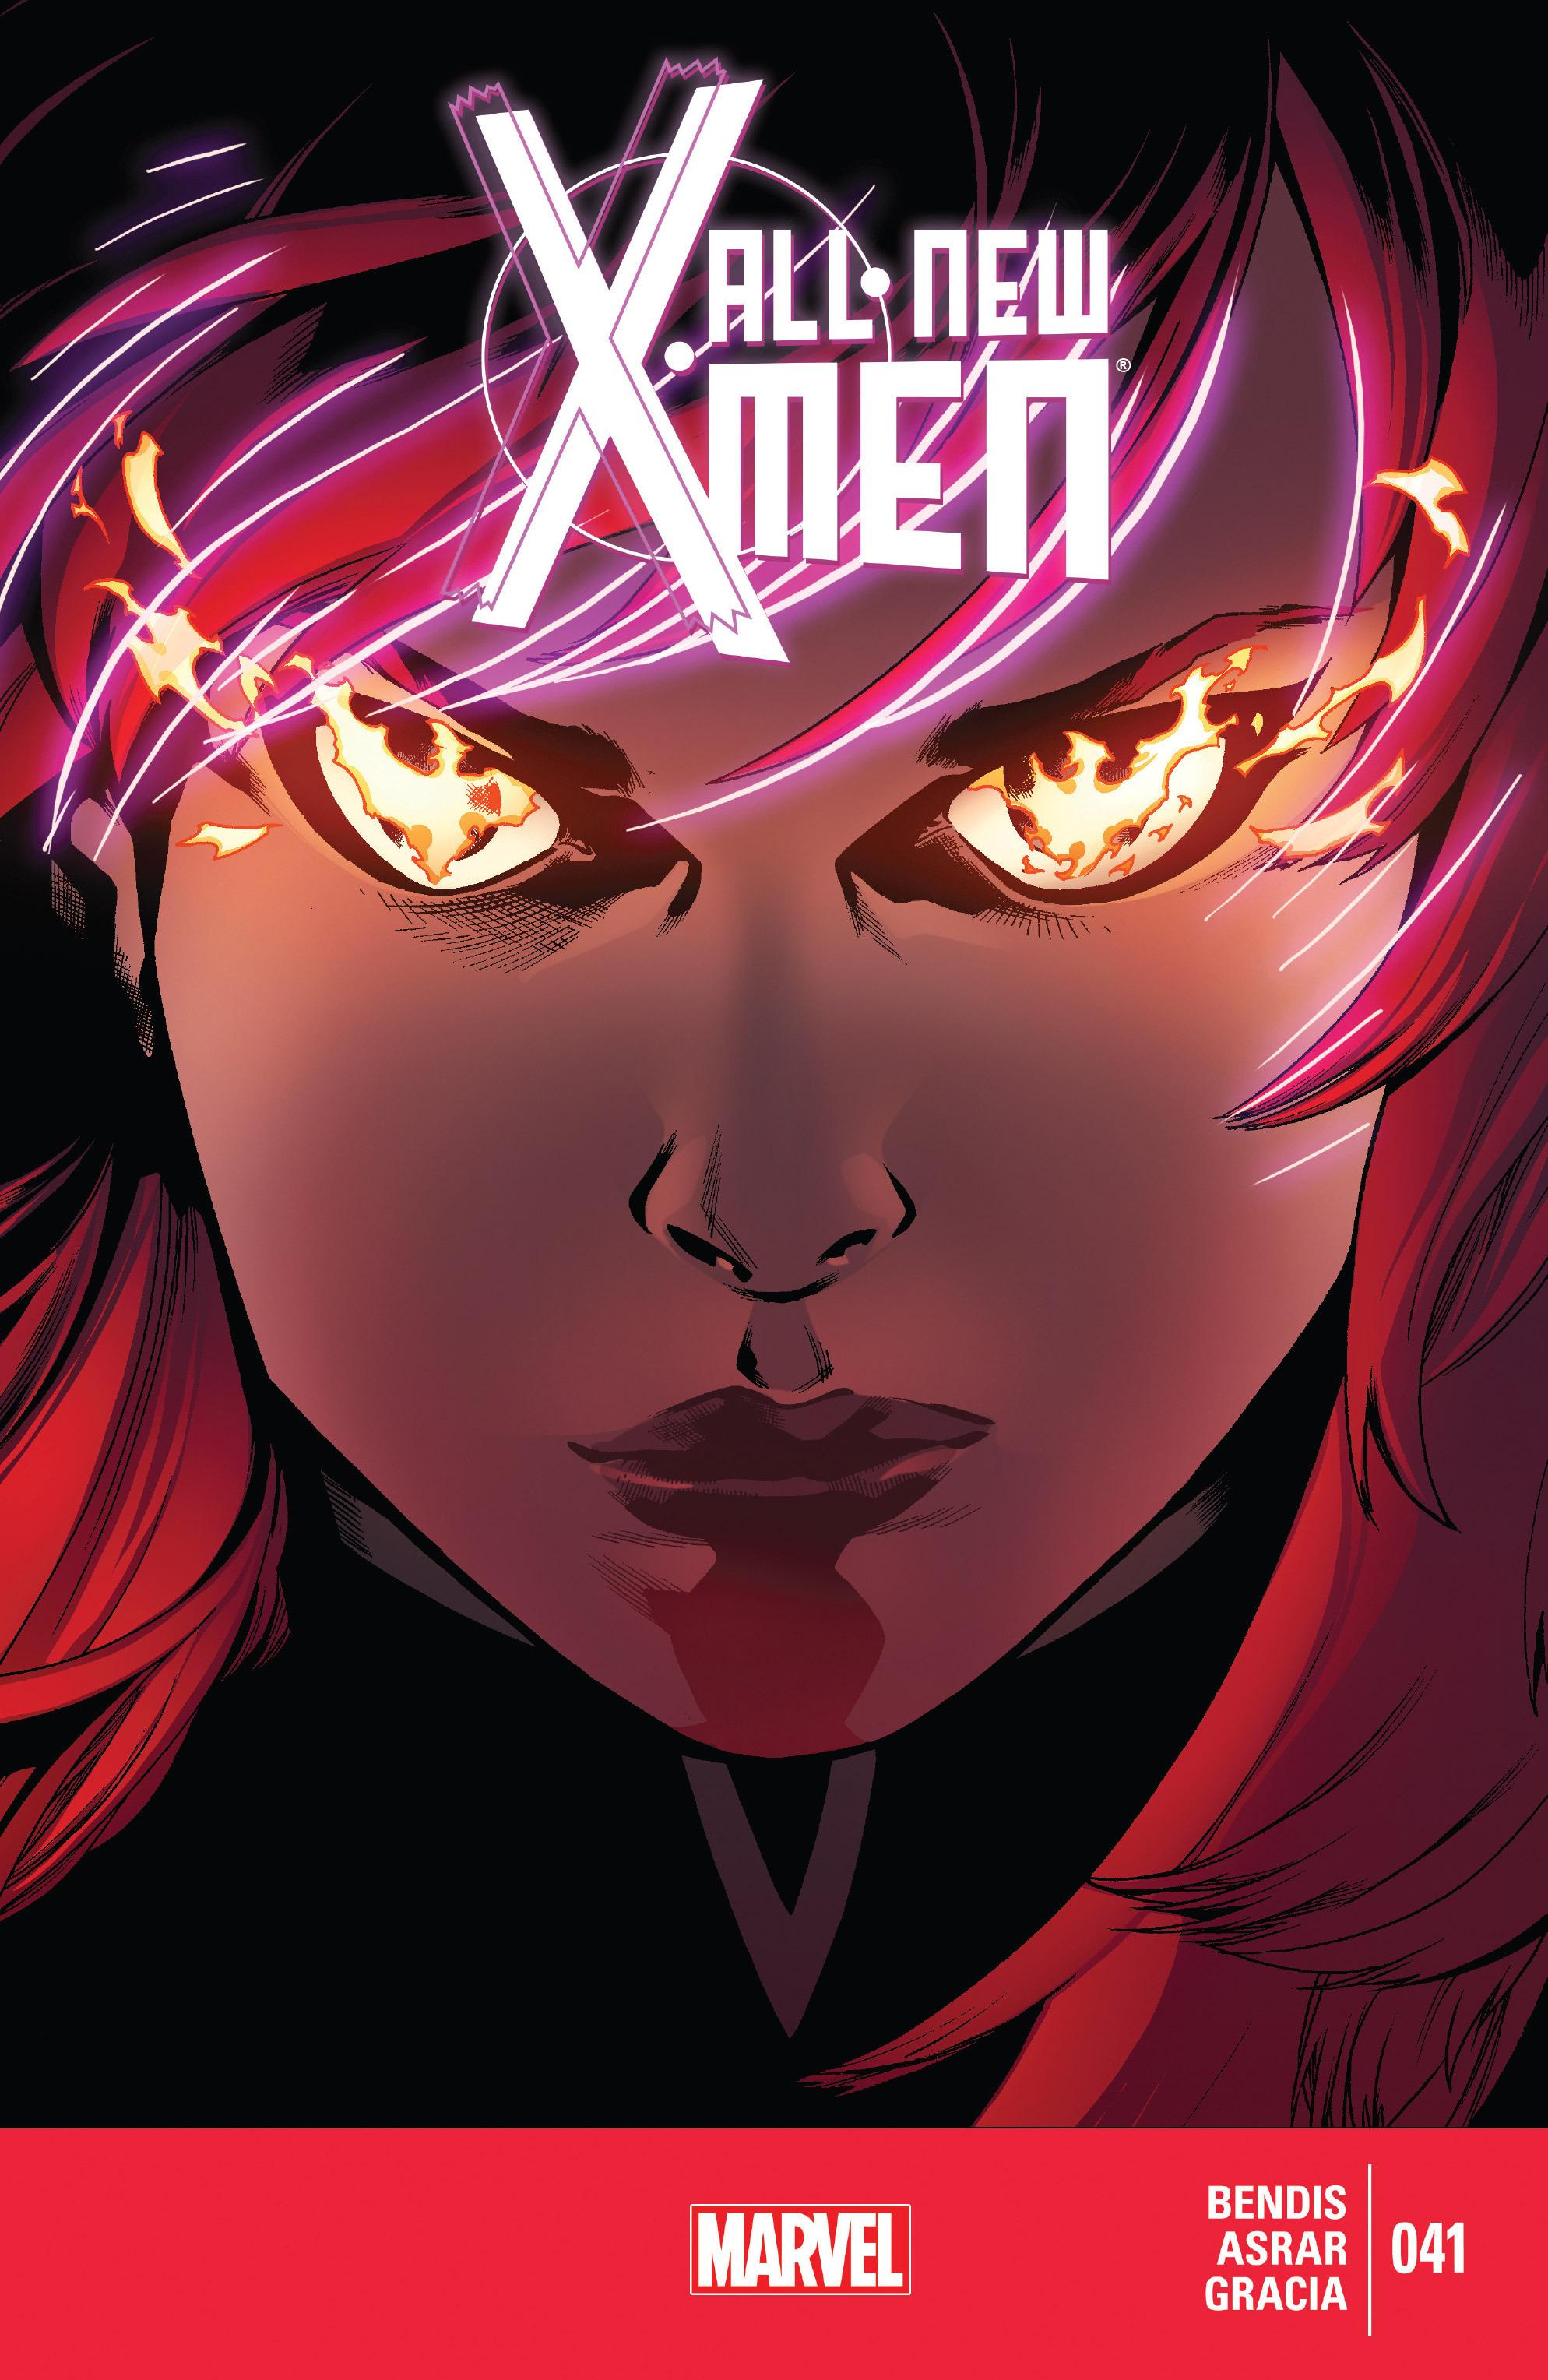 All-New X-Men (2013) chap 41 pic 1